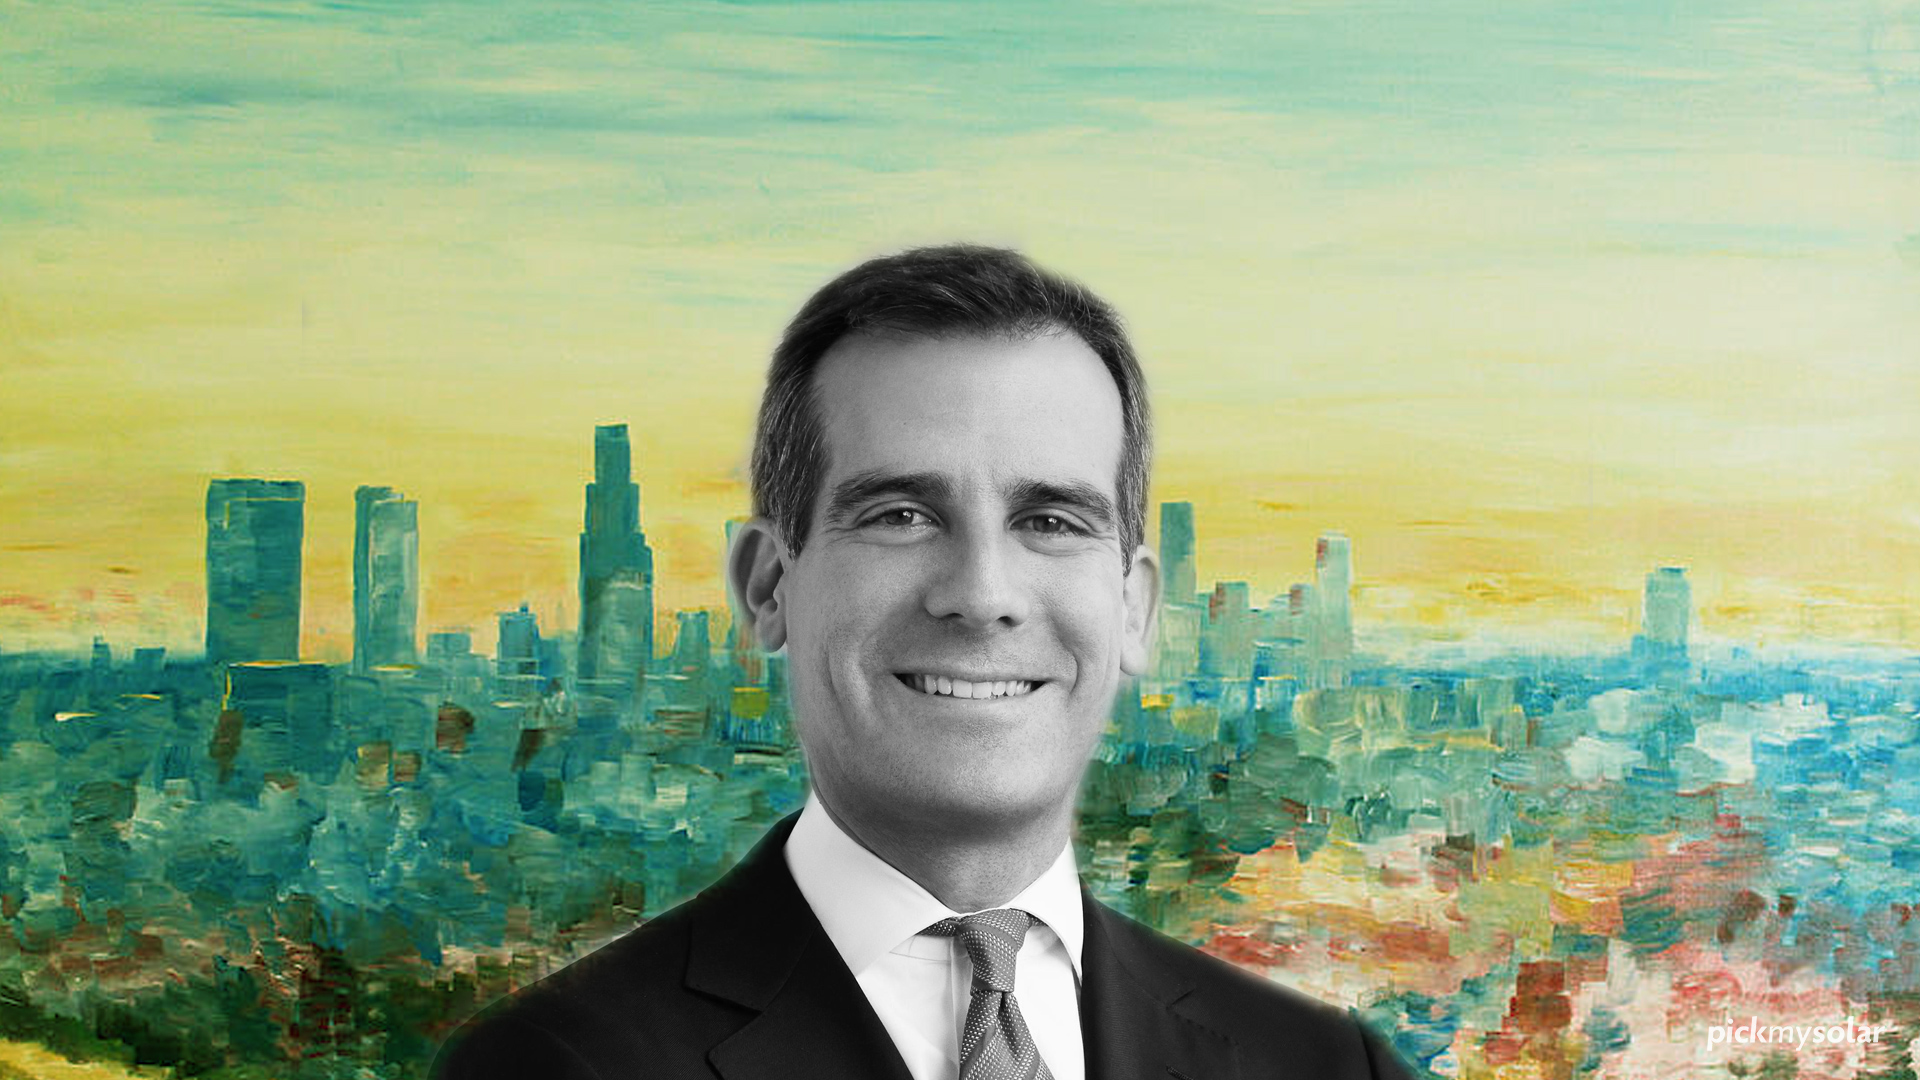 Mayor Garcetti on Moving L.A. Toward 100 Percent Renewable Energy